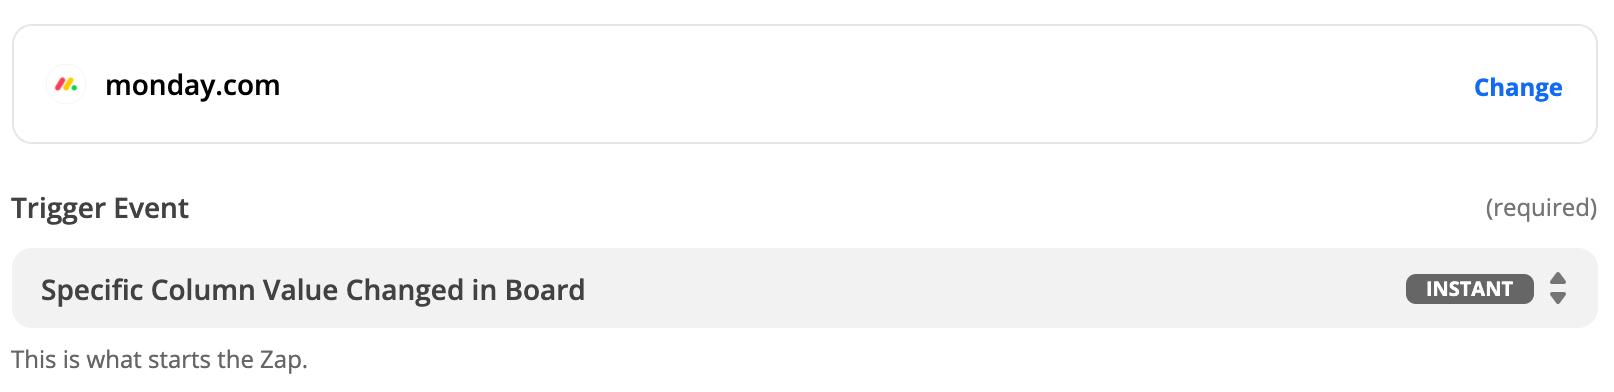 Adding a new entry monday.com trigger in Zapier